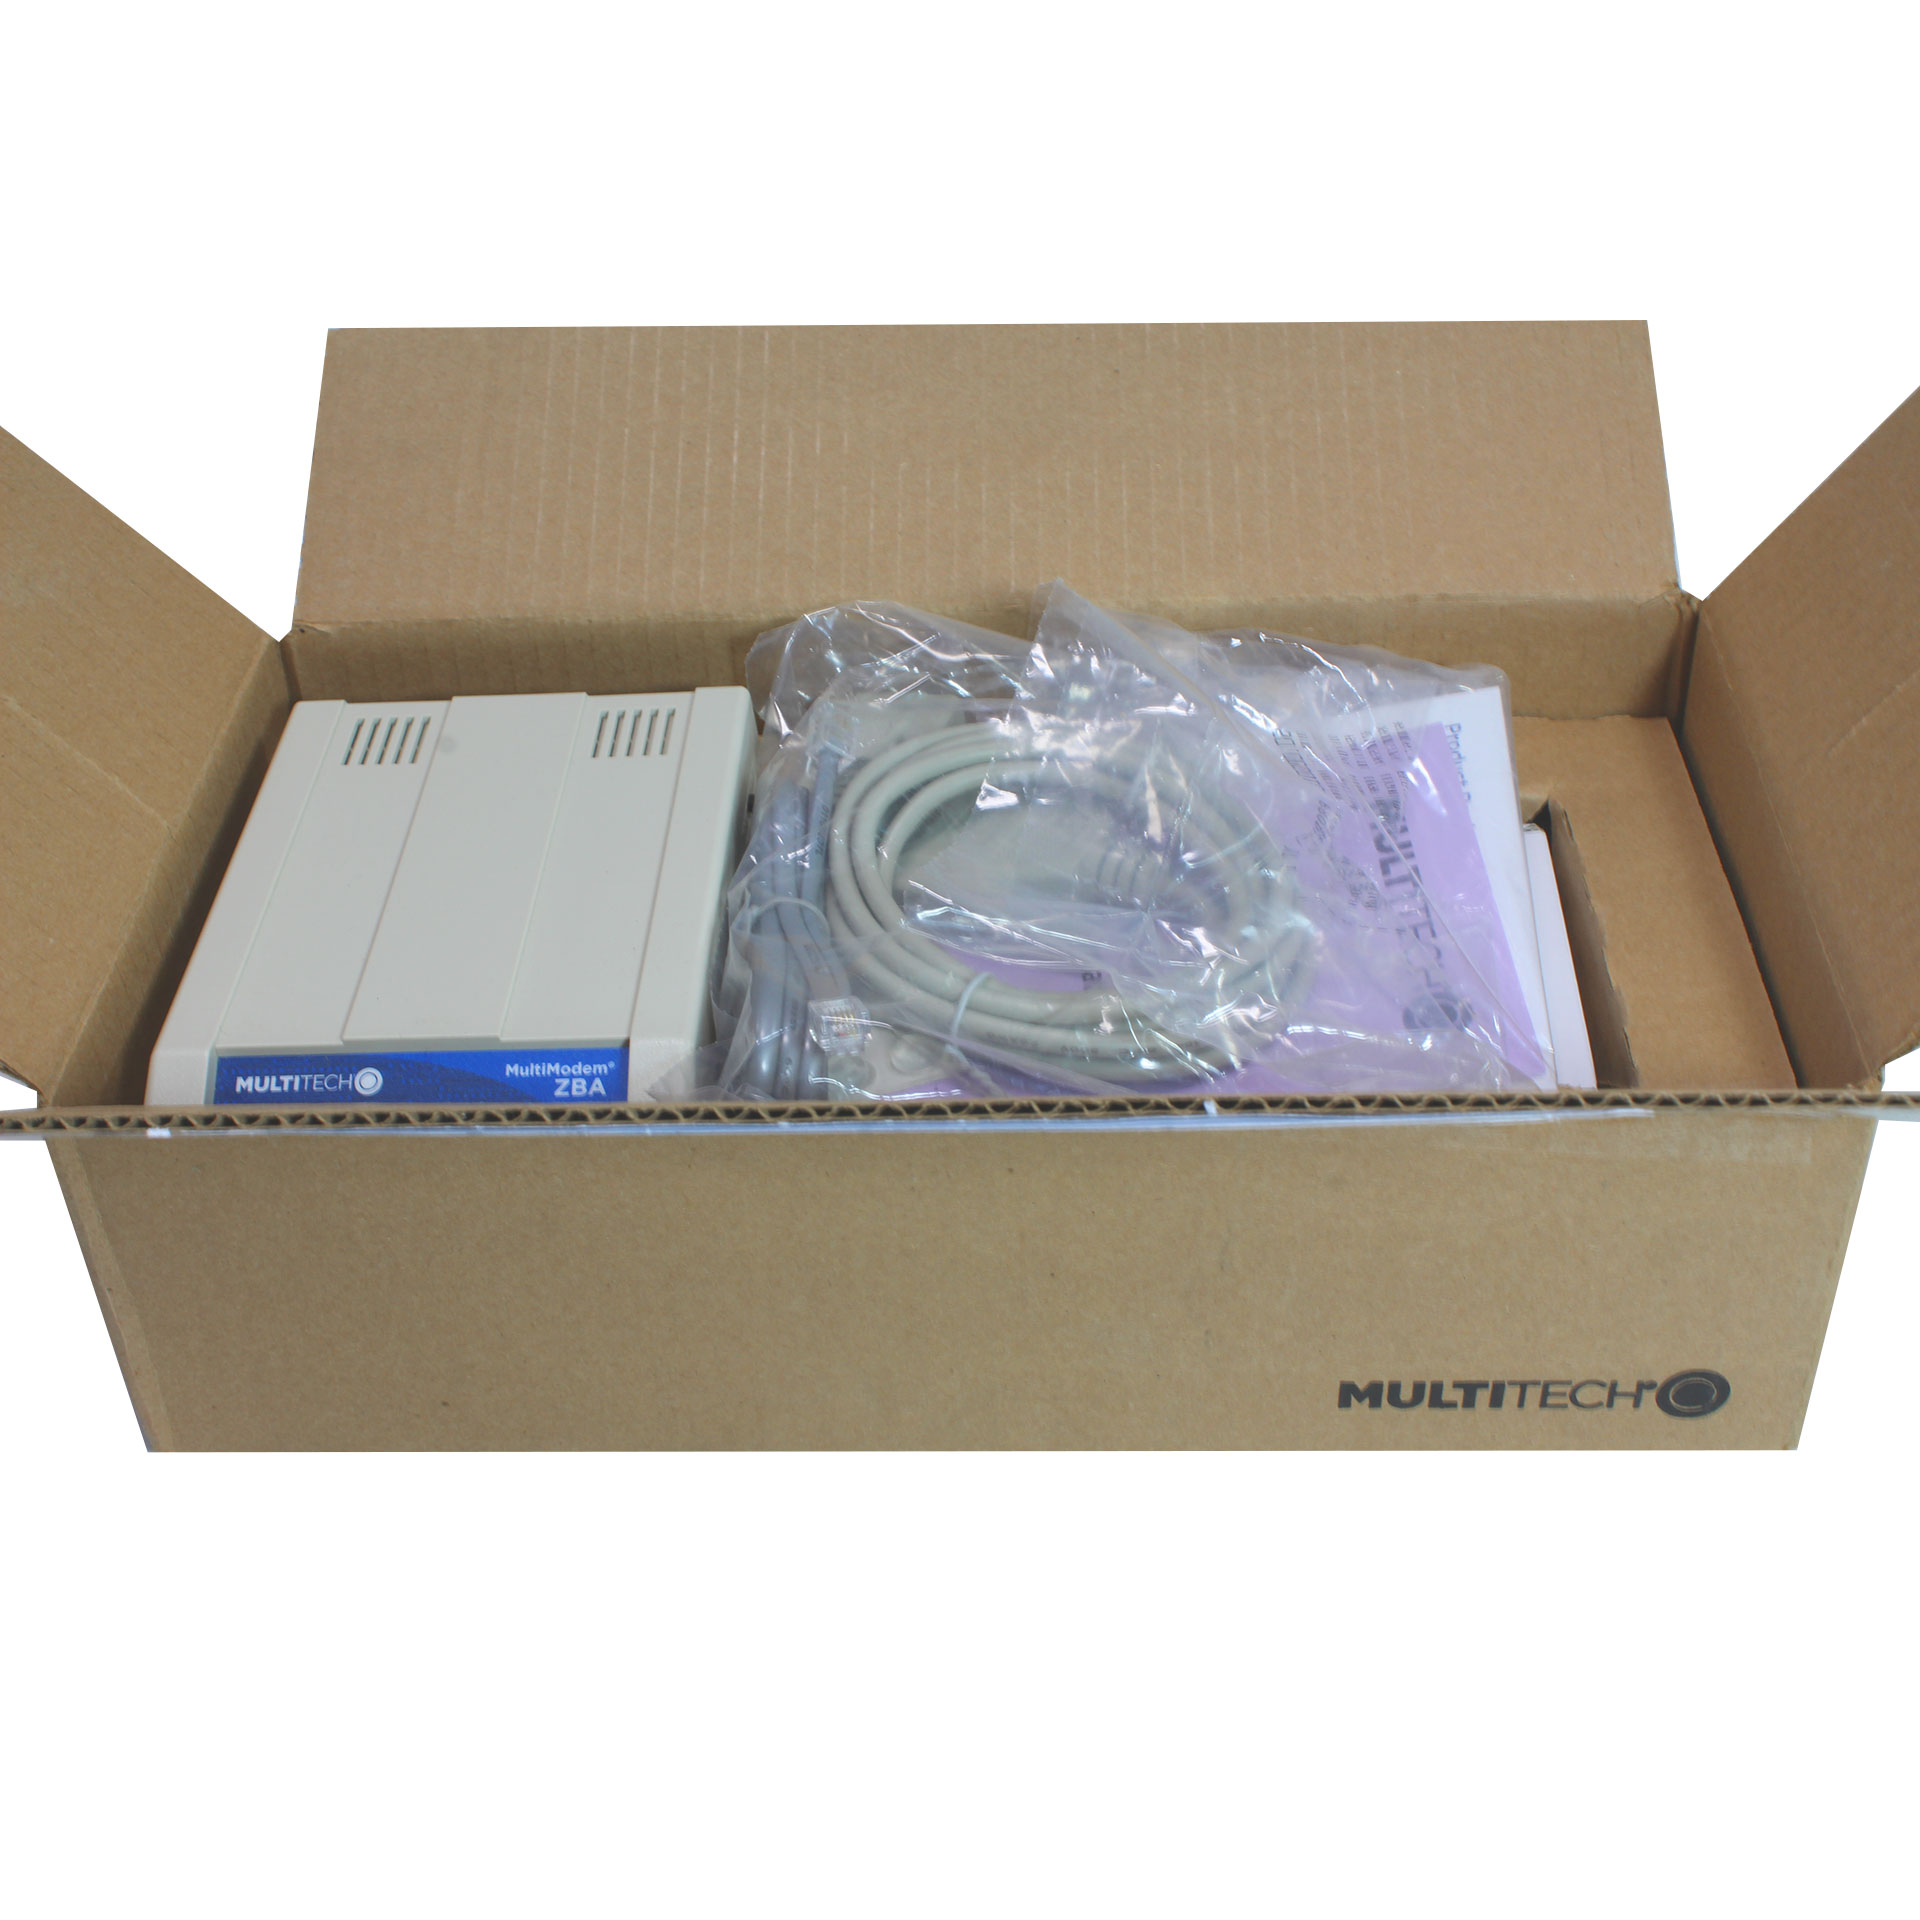 MultiTech Multimodem ZBA V92 Data Fax Modem MT9234ZBA NAM